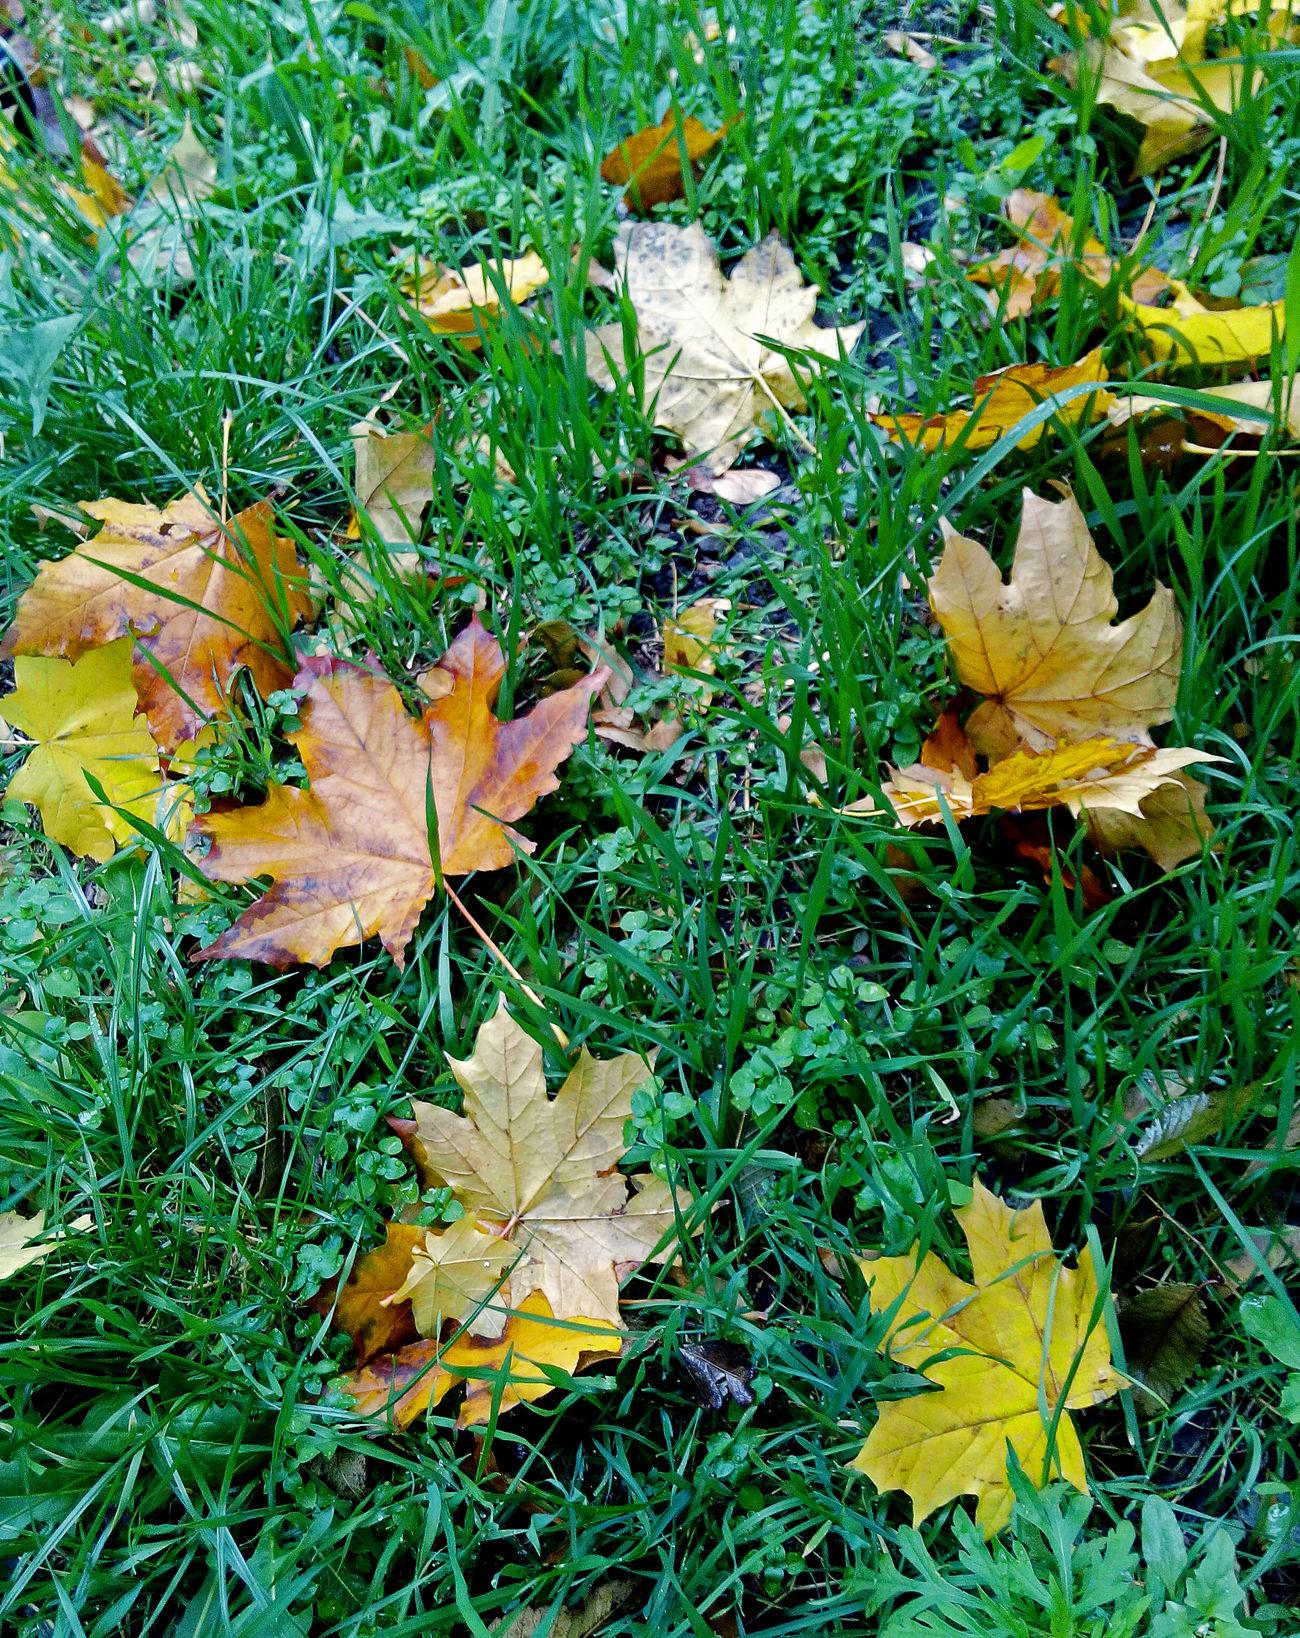 No People Beauty In Nature Nature Leaf Grass Green Color Outdoors Close-up Nature Yellow Green Color желтый красота Природа листья осенние листья Autumn🍁🍁🍁 Autumn Colors Коричневый Autumn After A Rain Wet Leaves после дождя  мокрые листья